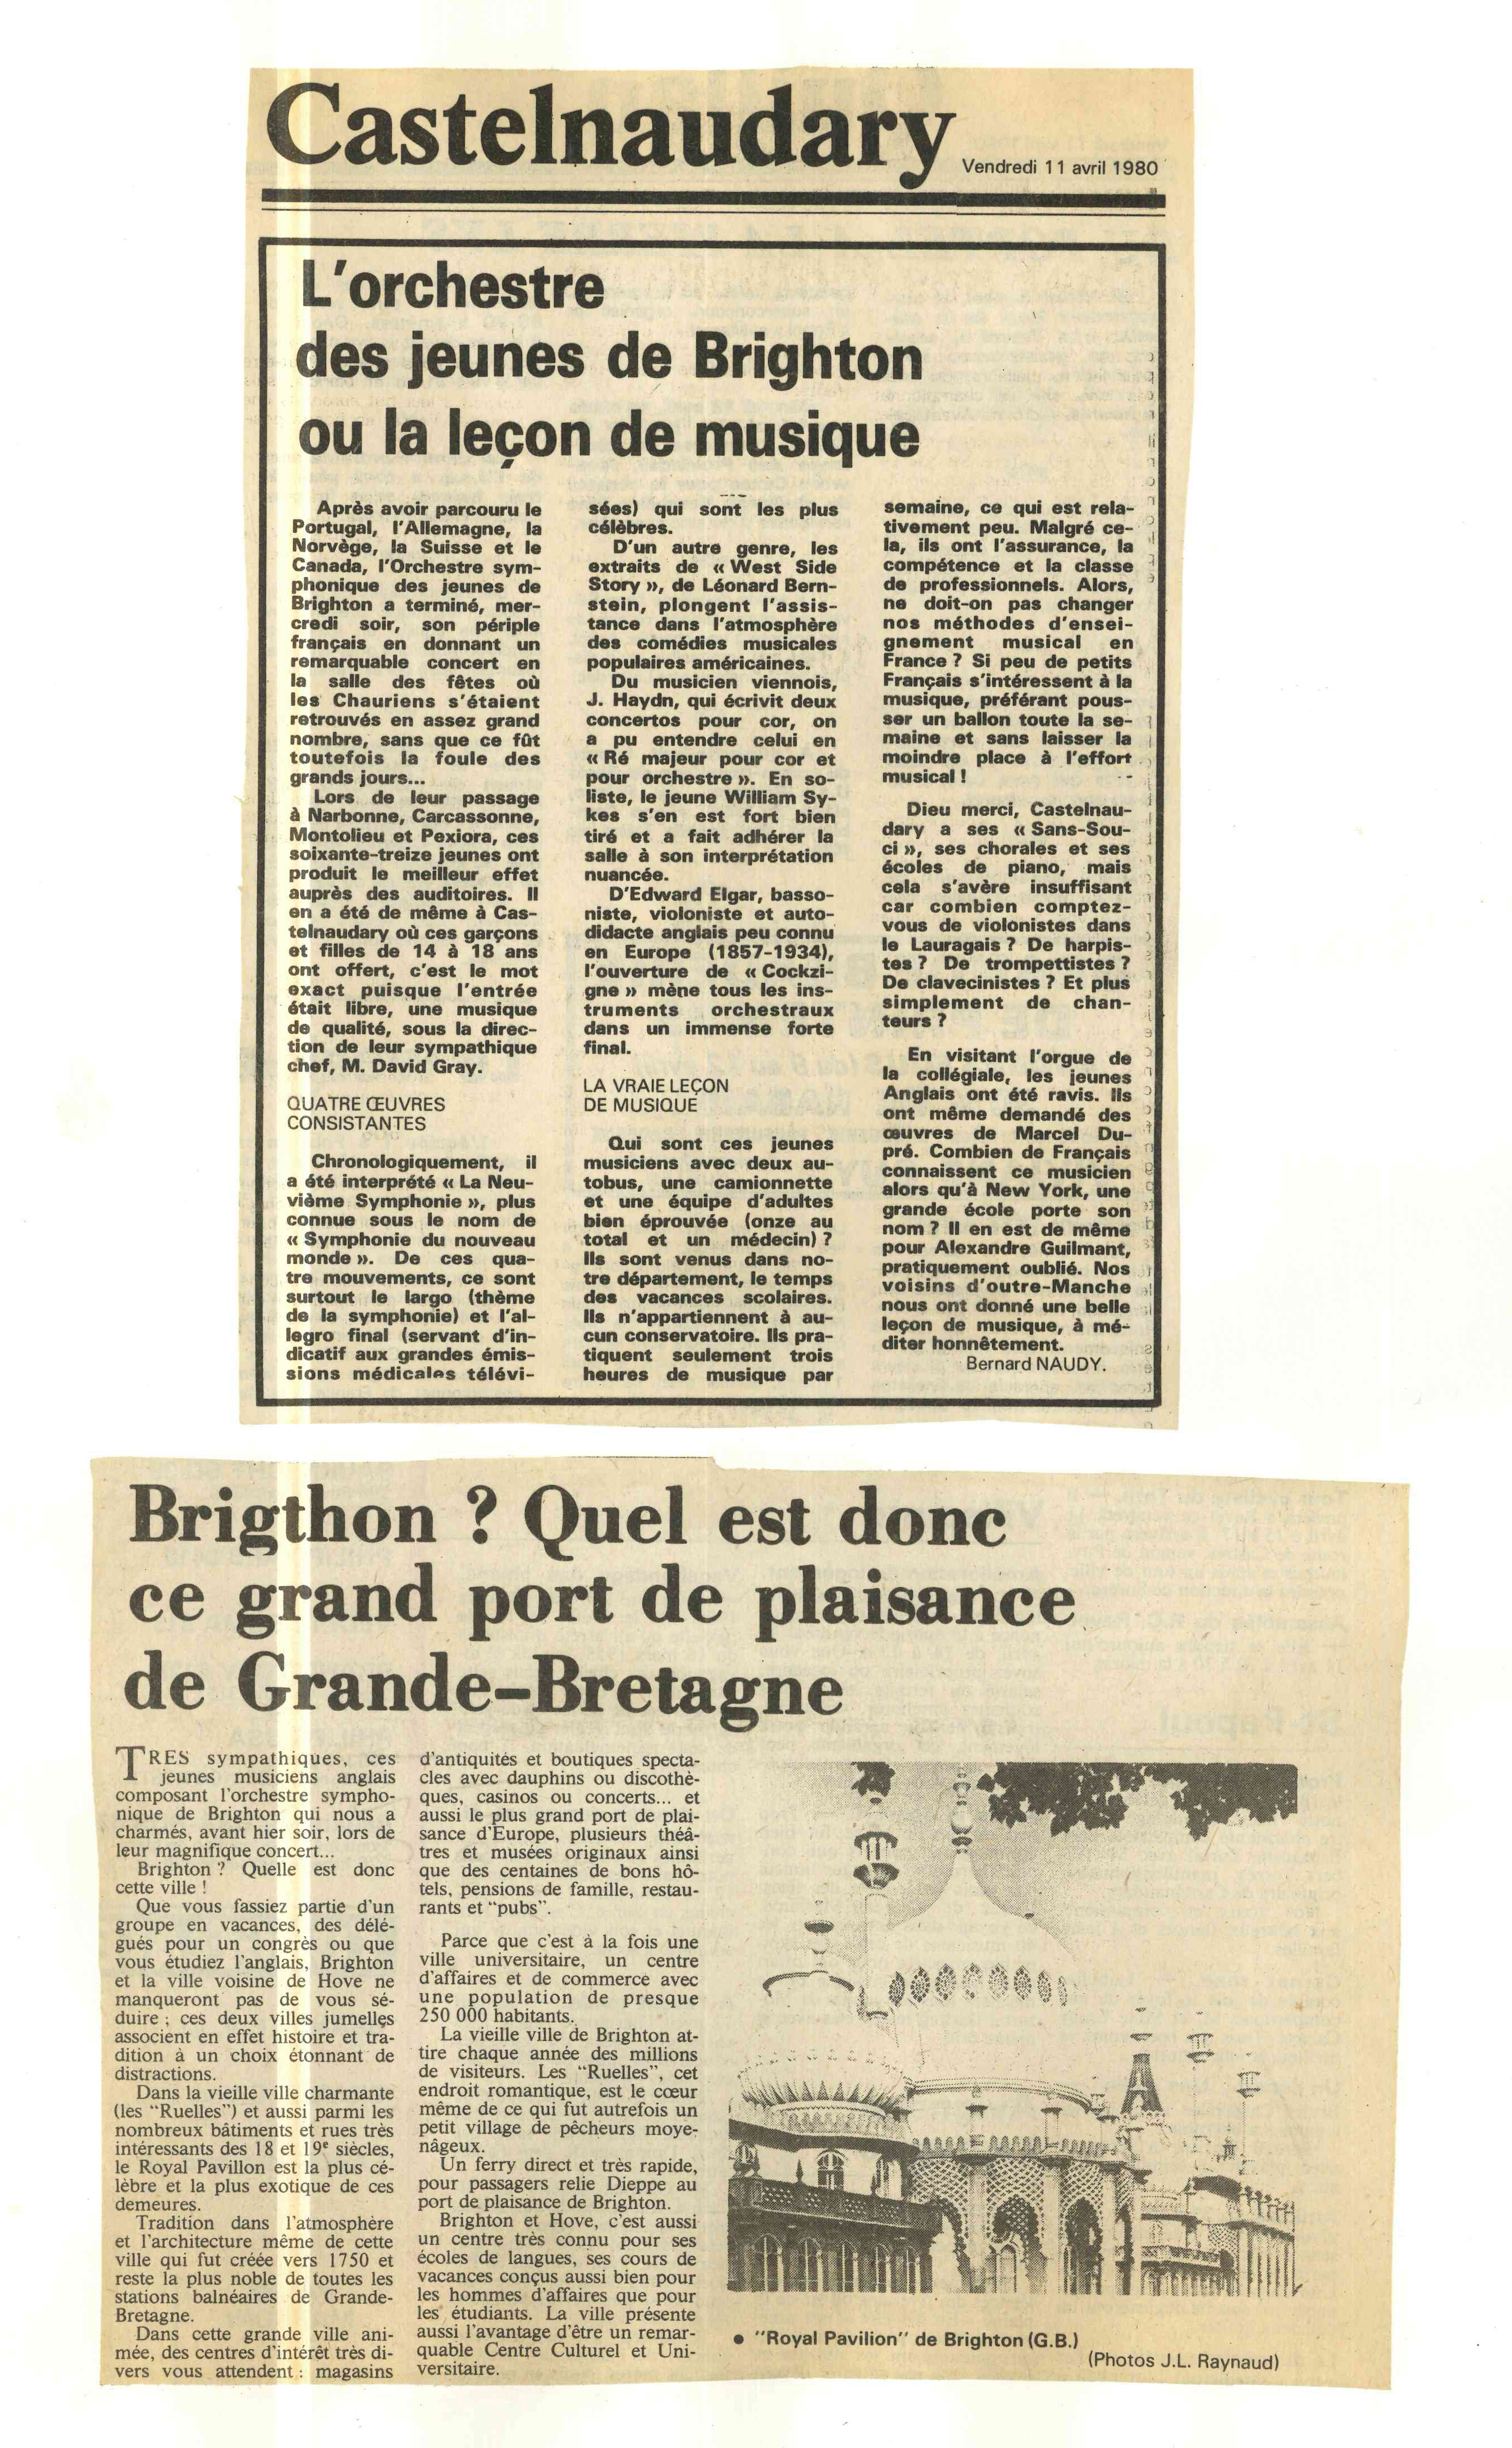 00192-Castelnaudary, 11th April 1980.jpg